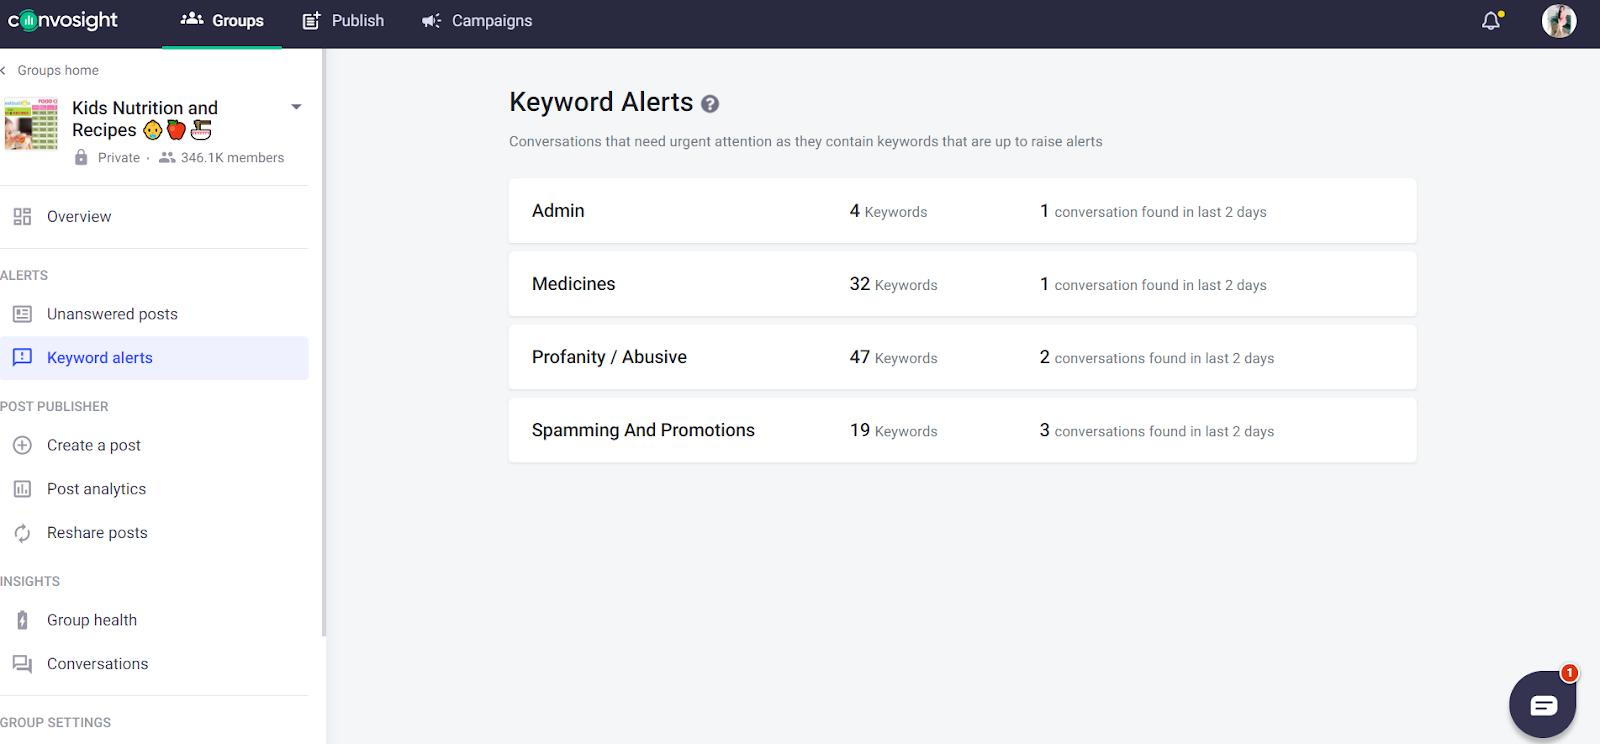 new keyword alerts on Convosight